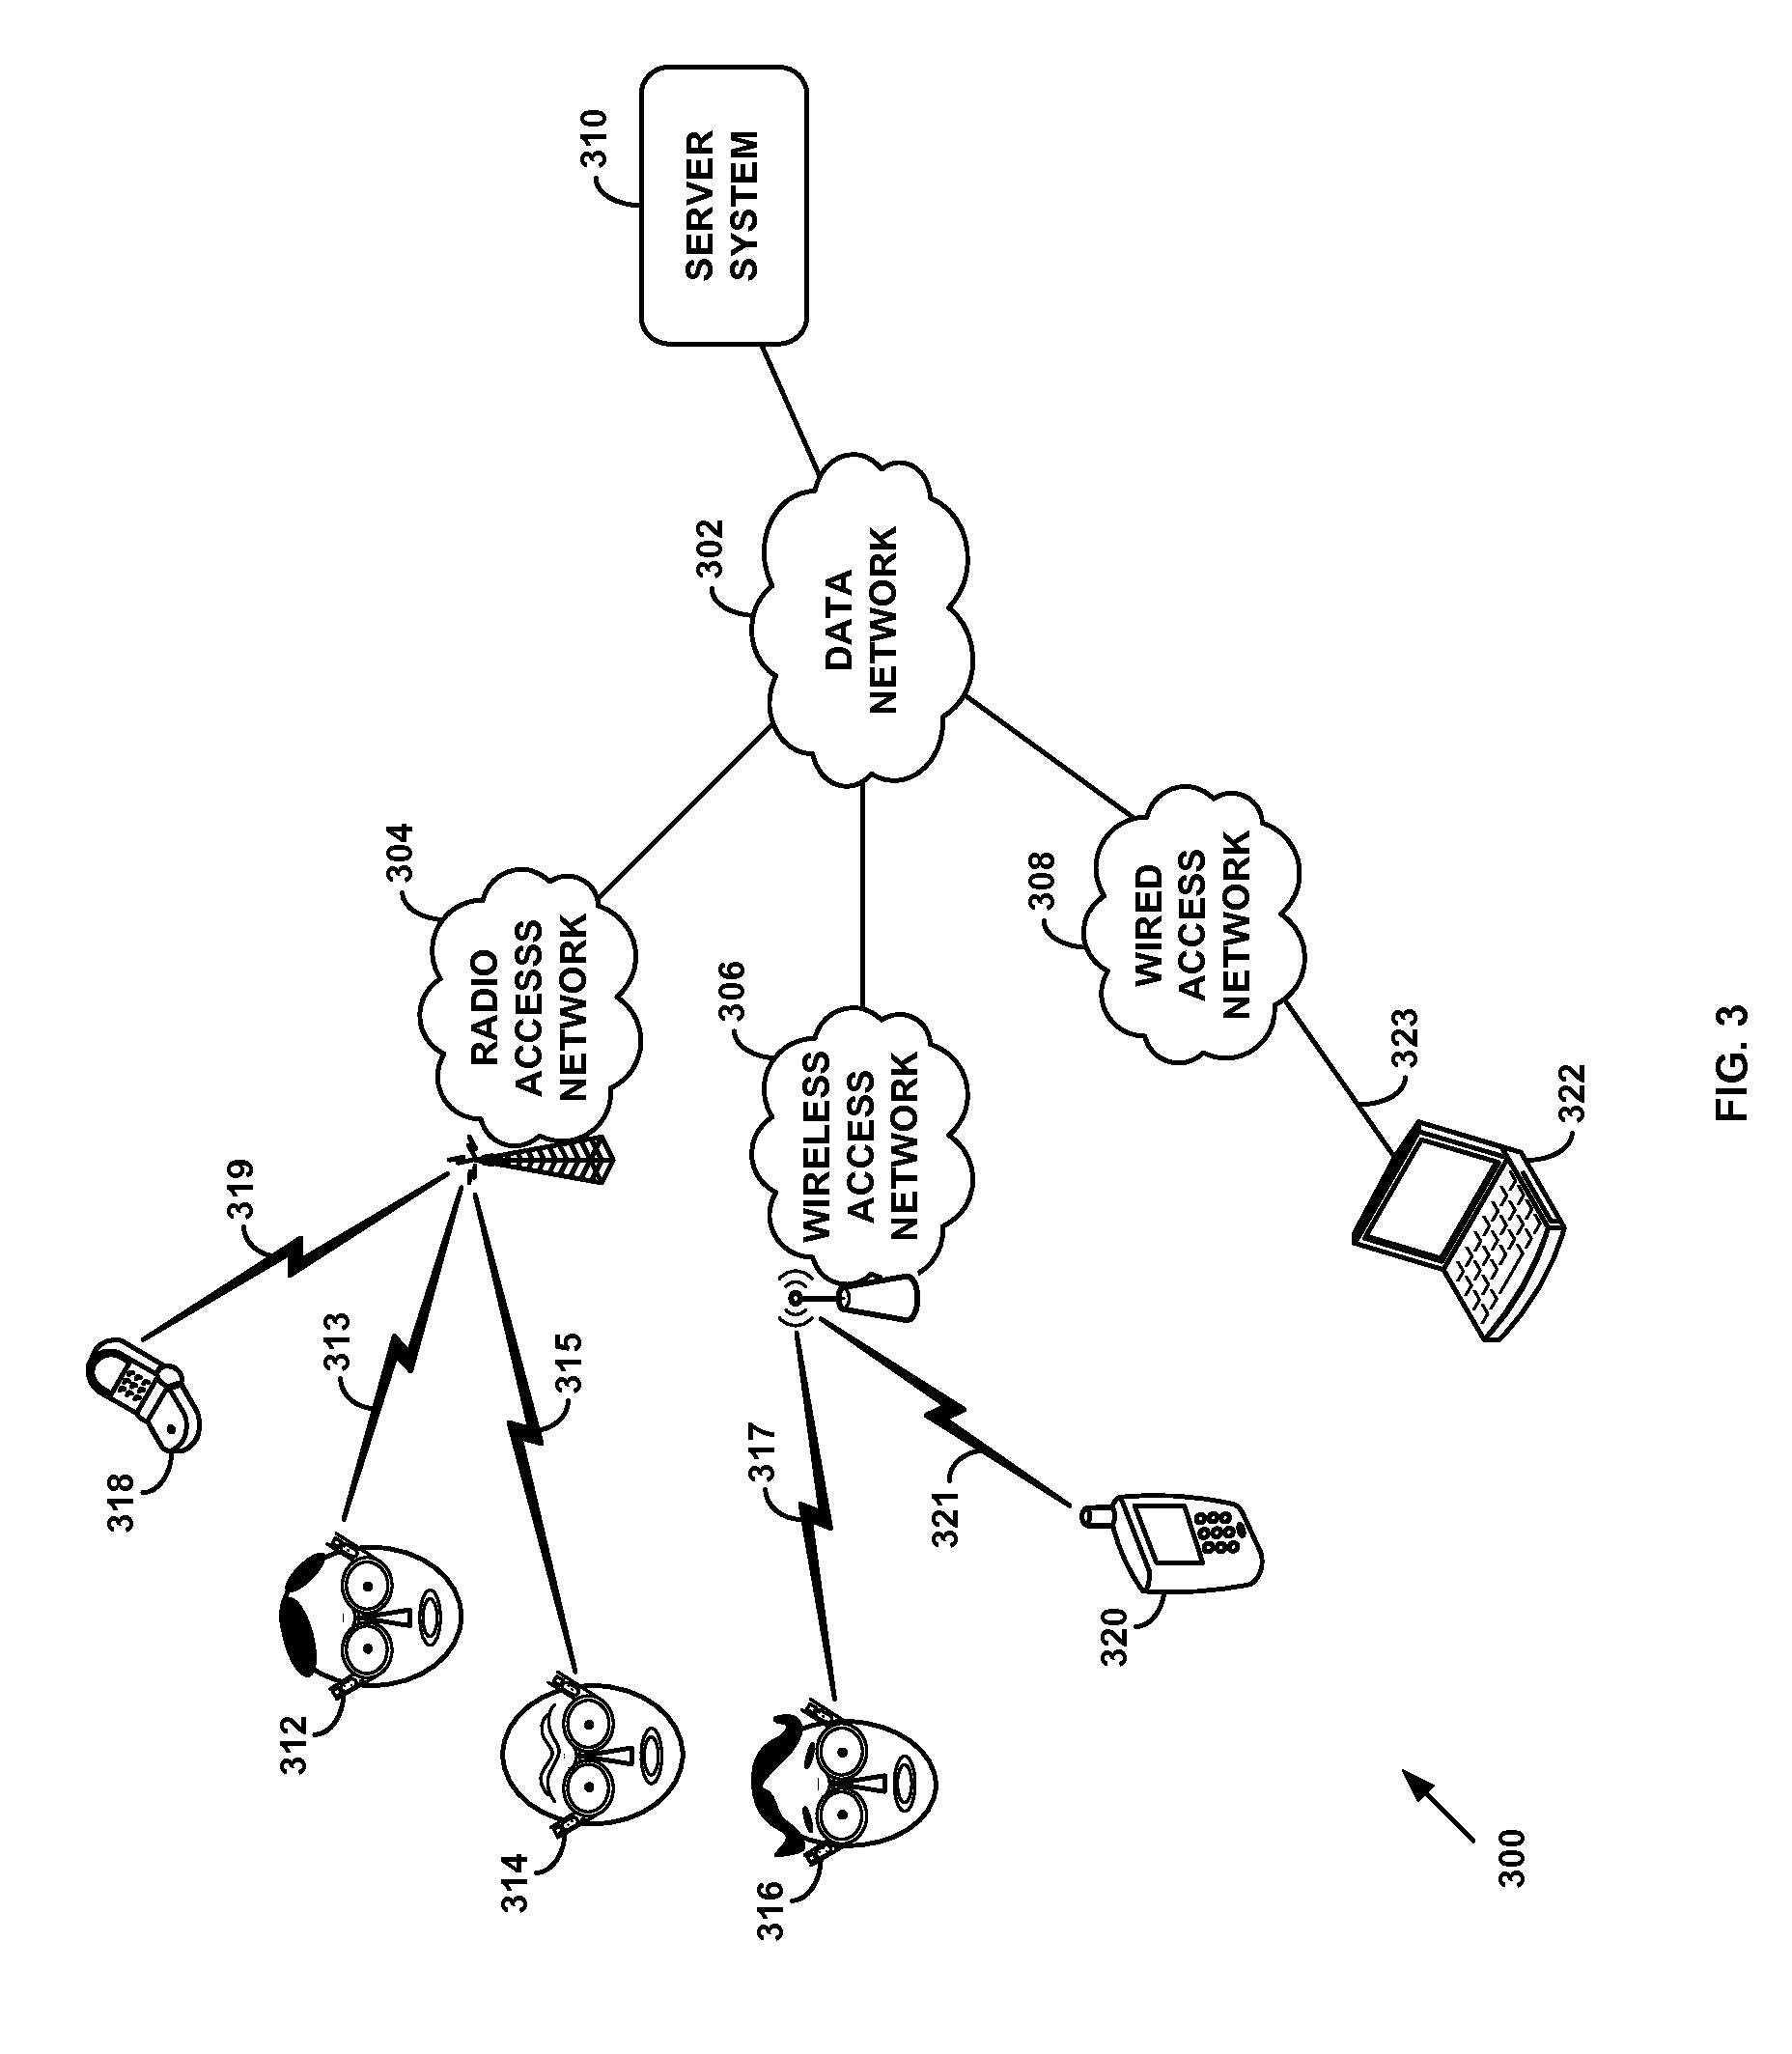 patent us 8 179 604 b1  patent